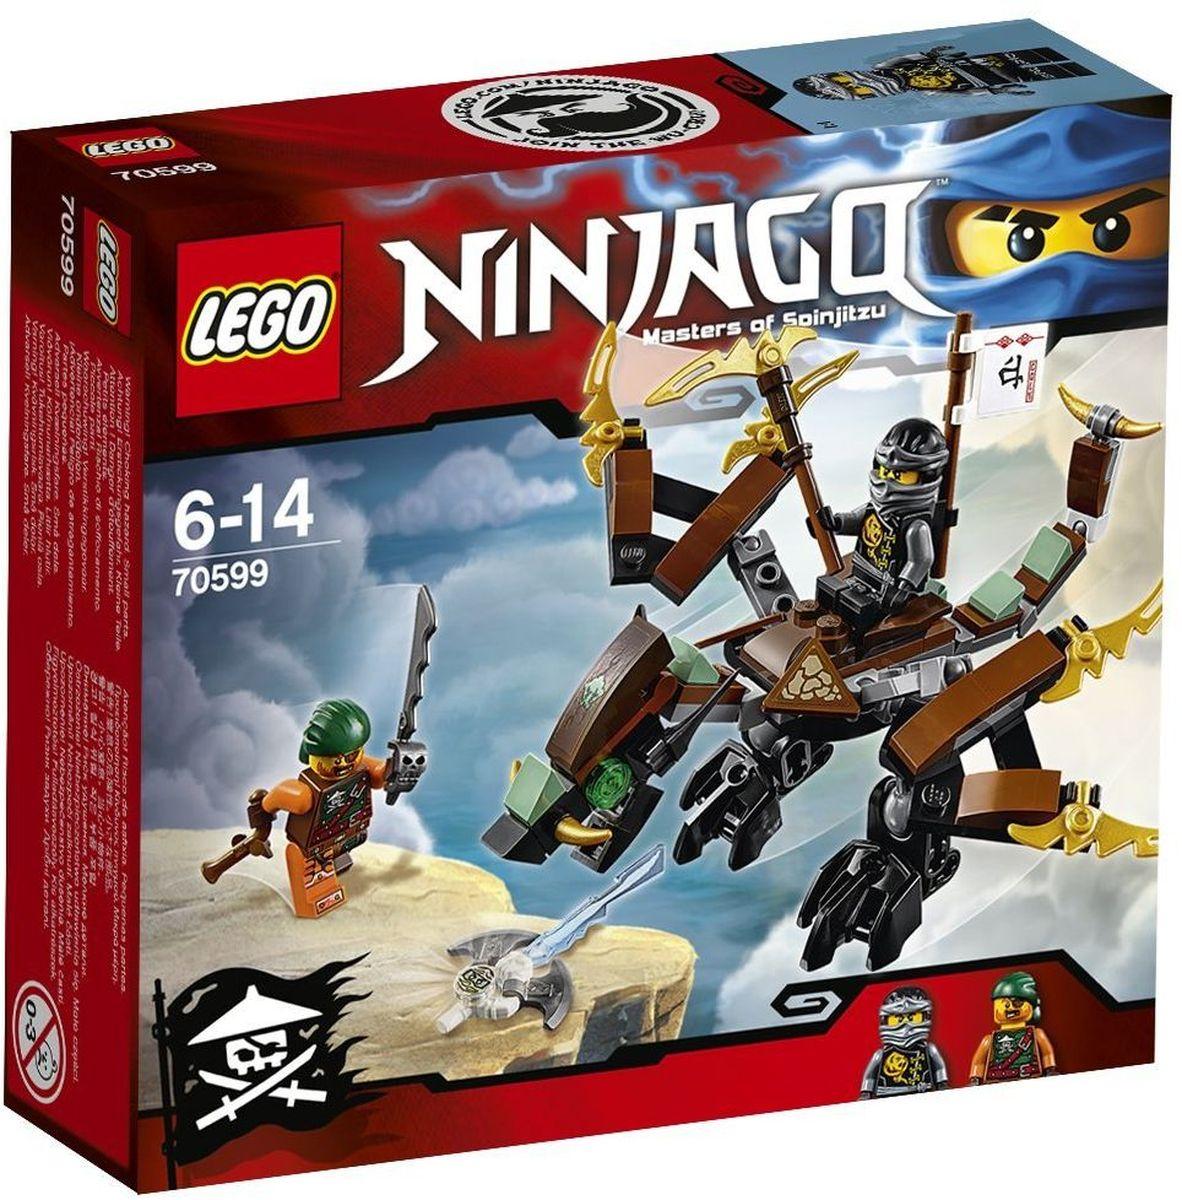 LEGO NINJAGO Конструктор Дракон Коула 70599